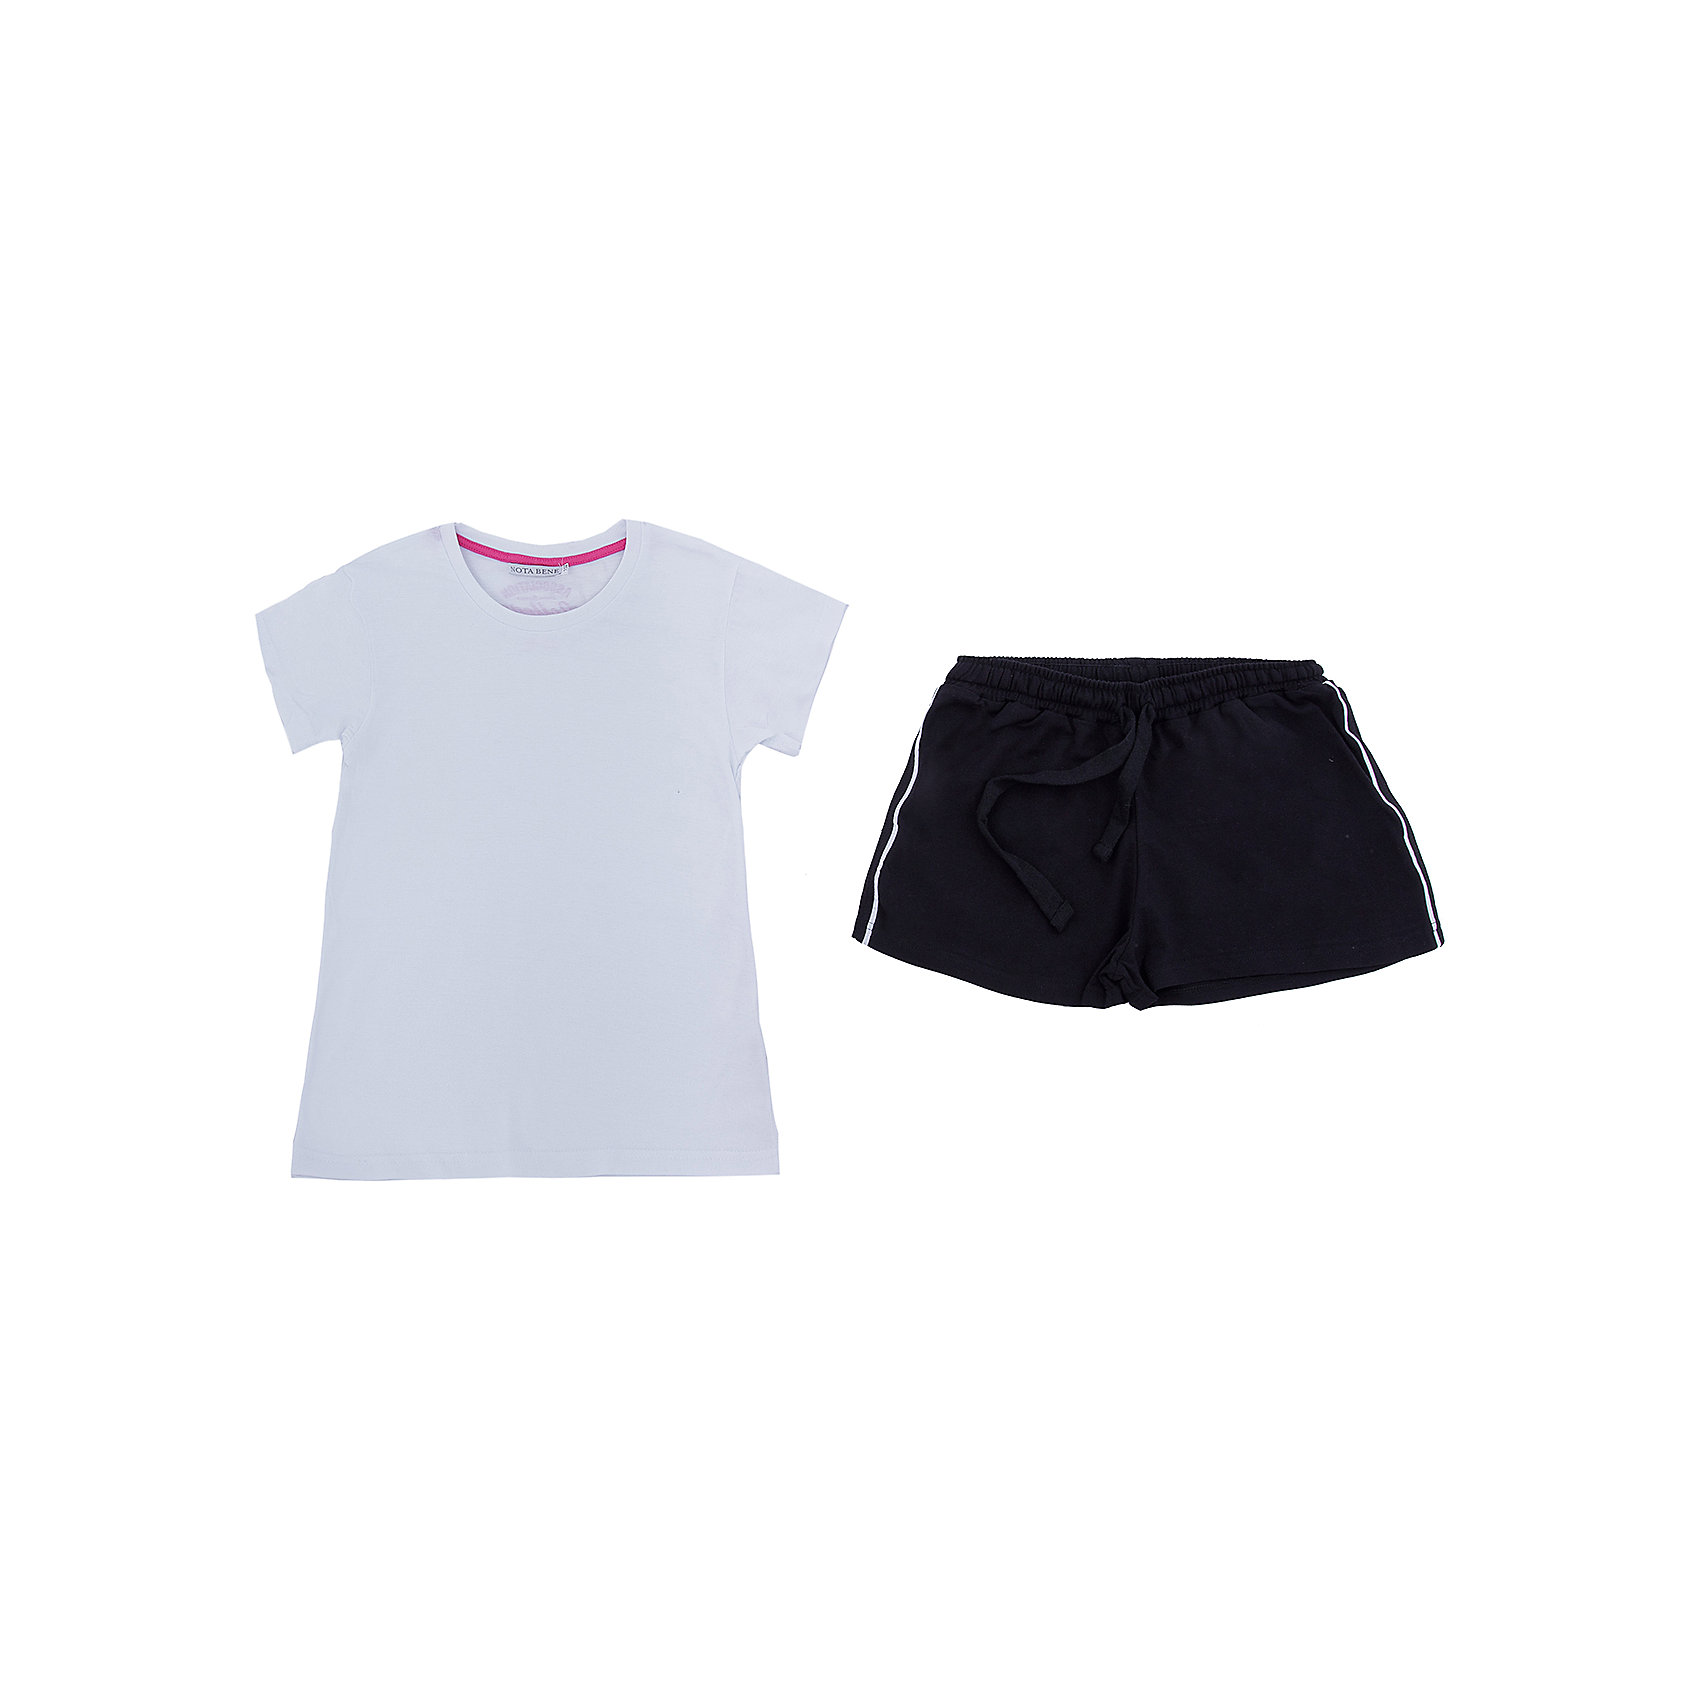 Комплект: футболка и шорты Nota Bene для девочкиКомплекты<br>Комплект для девочки:футболка и шорты. Соответствует размеру.<br>Состав:<br>95% хлопок; 5% лайкра<br><br>Ширина мм: 191<br>Глубина мм: 10<br>Высота мм: 175<br>Вес г: 273<br>Цвет: белый<br>Возраст от месяцев: 156<br>Возраст до месяцев: 168<br>Пол: Женский<br>Возраст: Детский<br>Размер: 164,152<br>SKU: 7012673